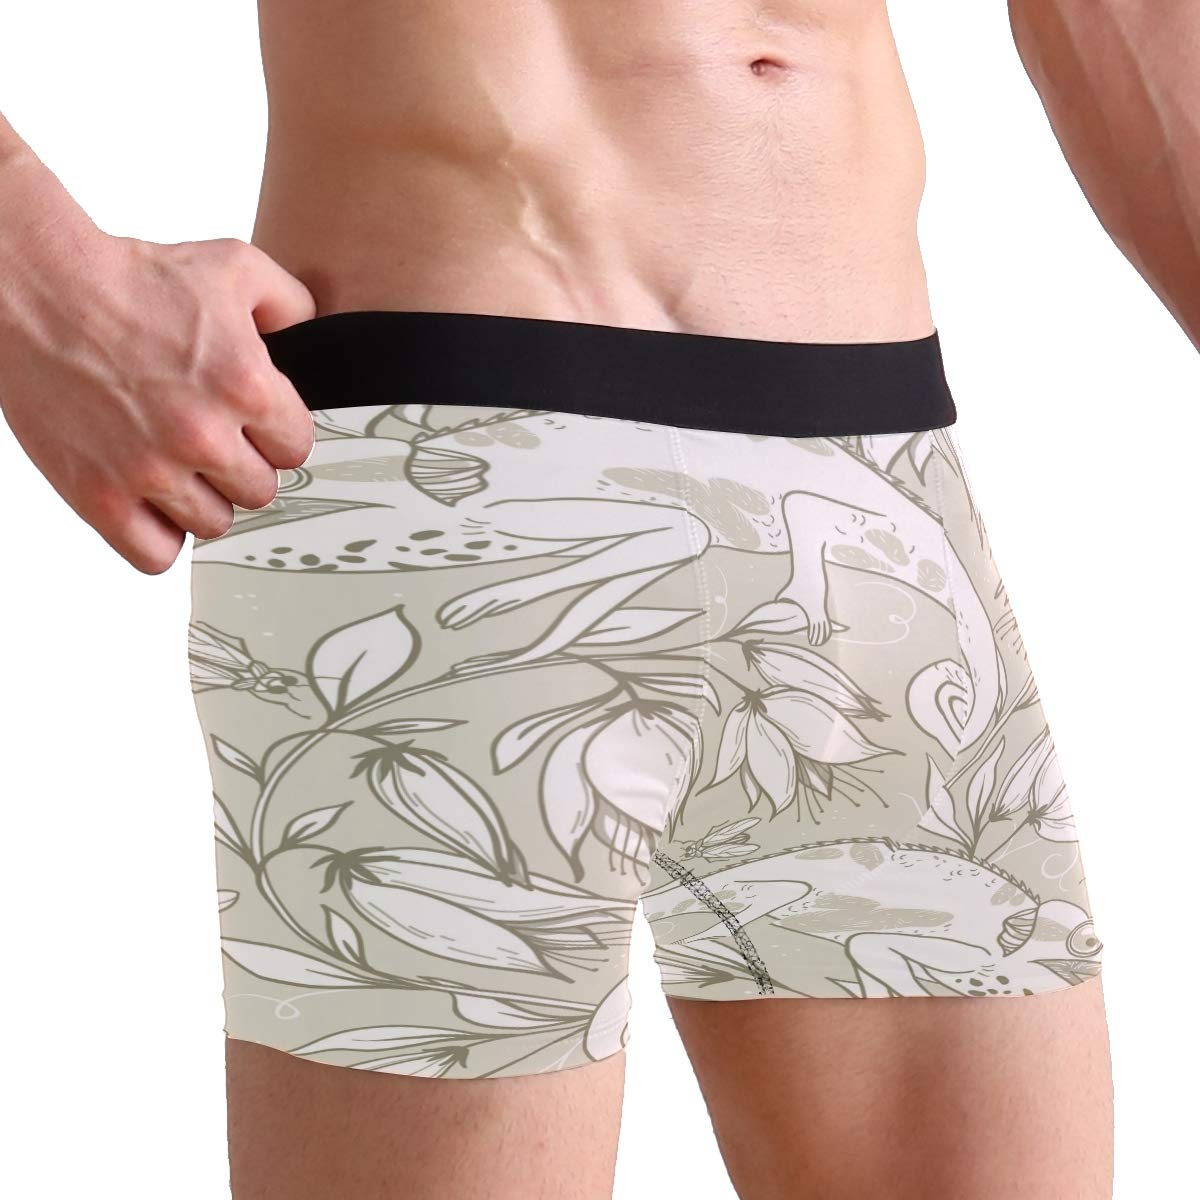 ZZKKO Chameleon Floral Mens Boxer Briefs Underwear Breathable Stretch Boxer Trunk with Pouch S-XL